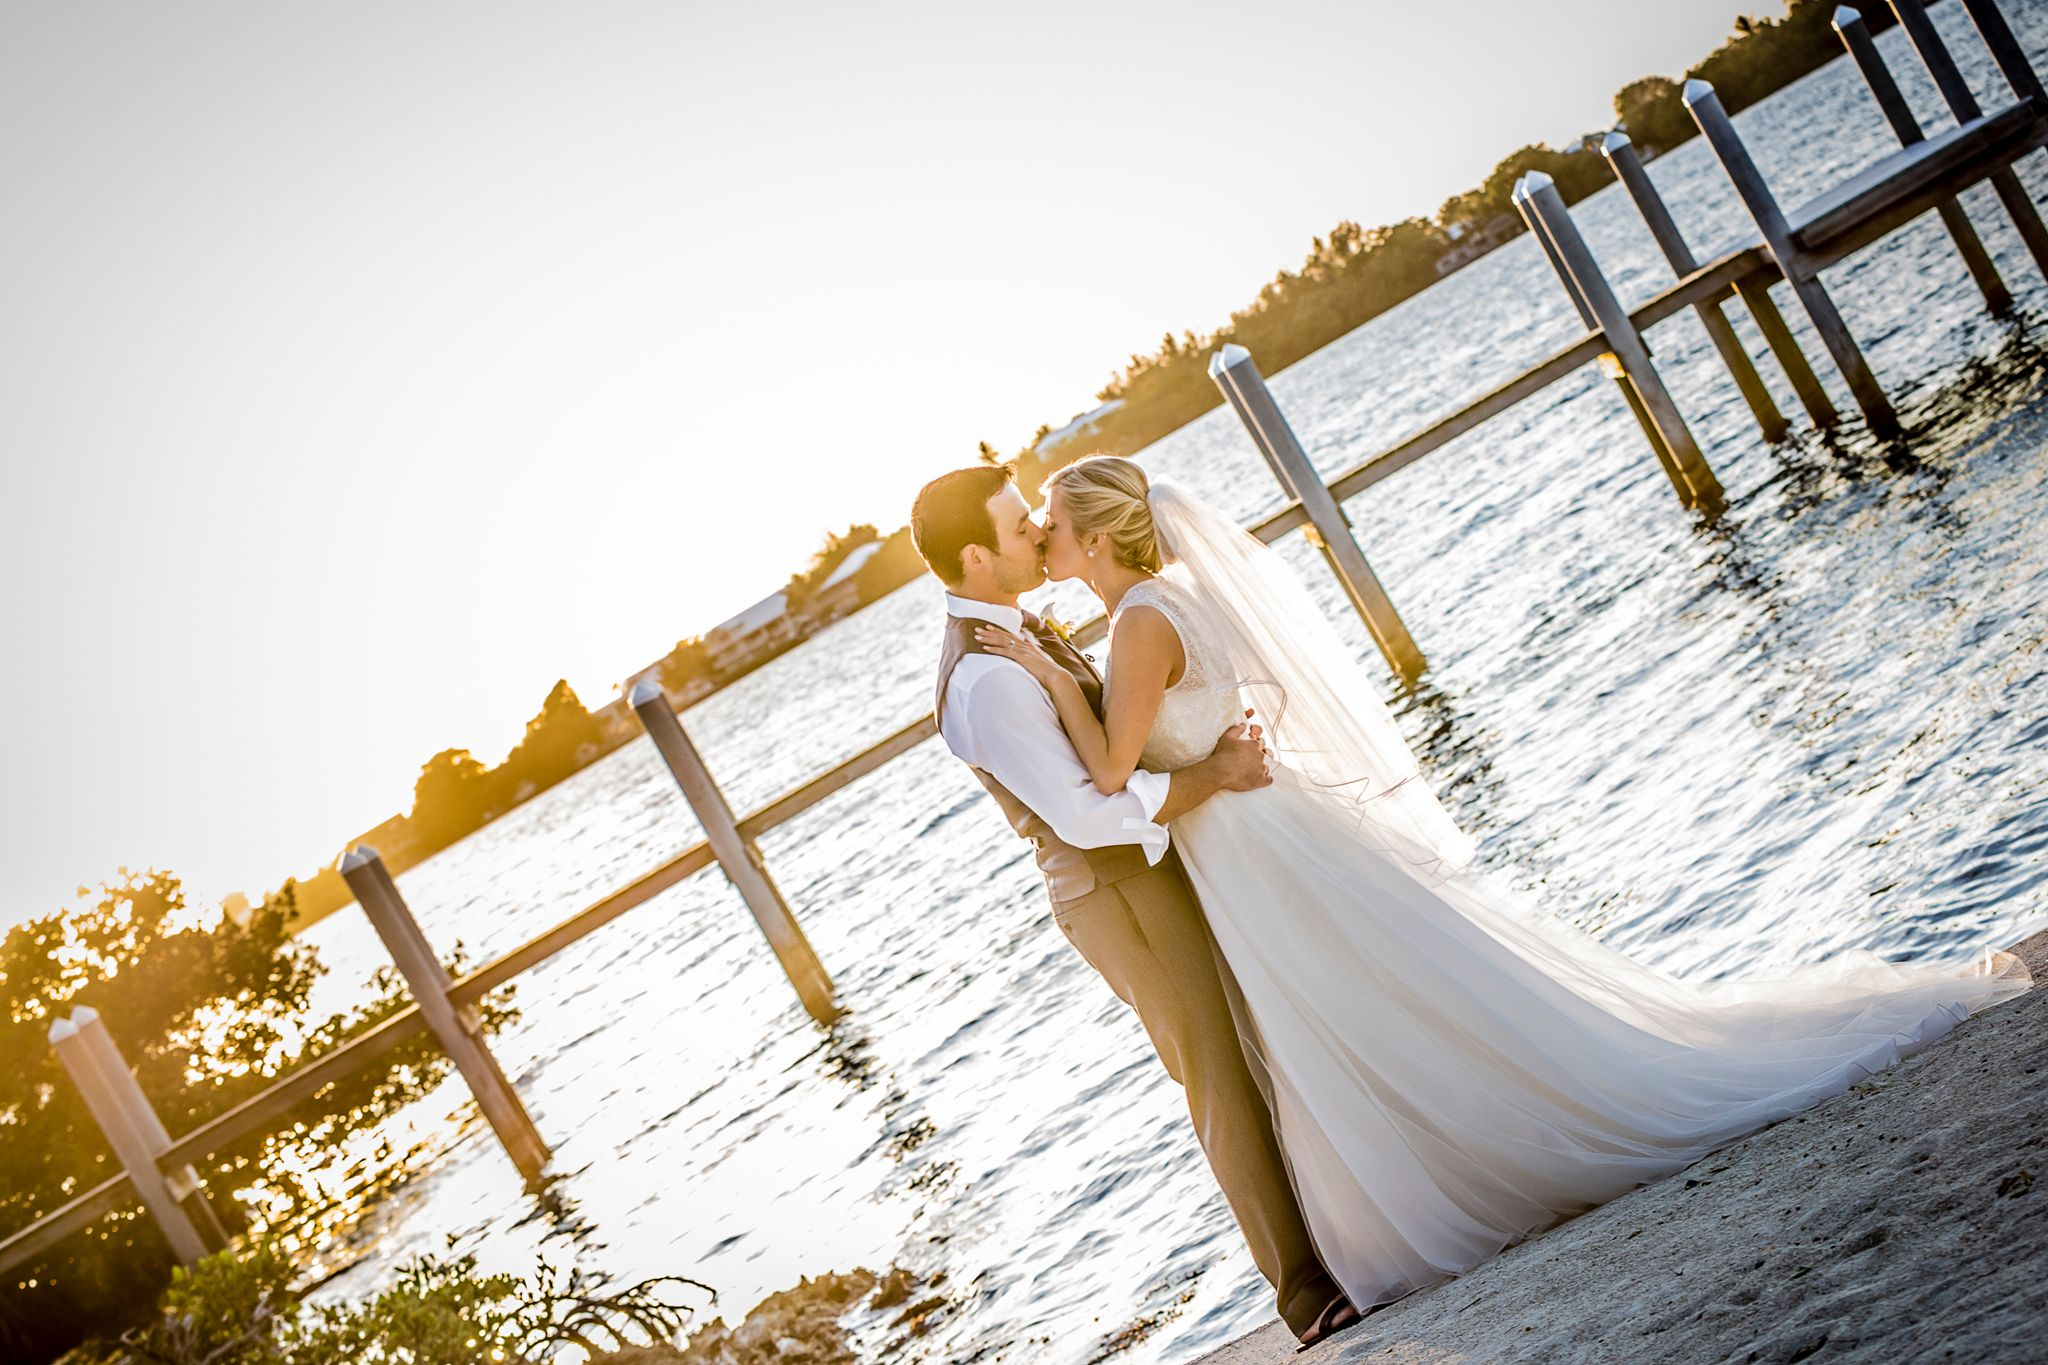 Long beach lighthouse wedding   Things You Need to Know About Summer Weddings  Weddings Wedding